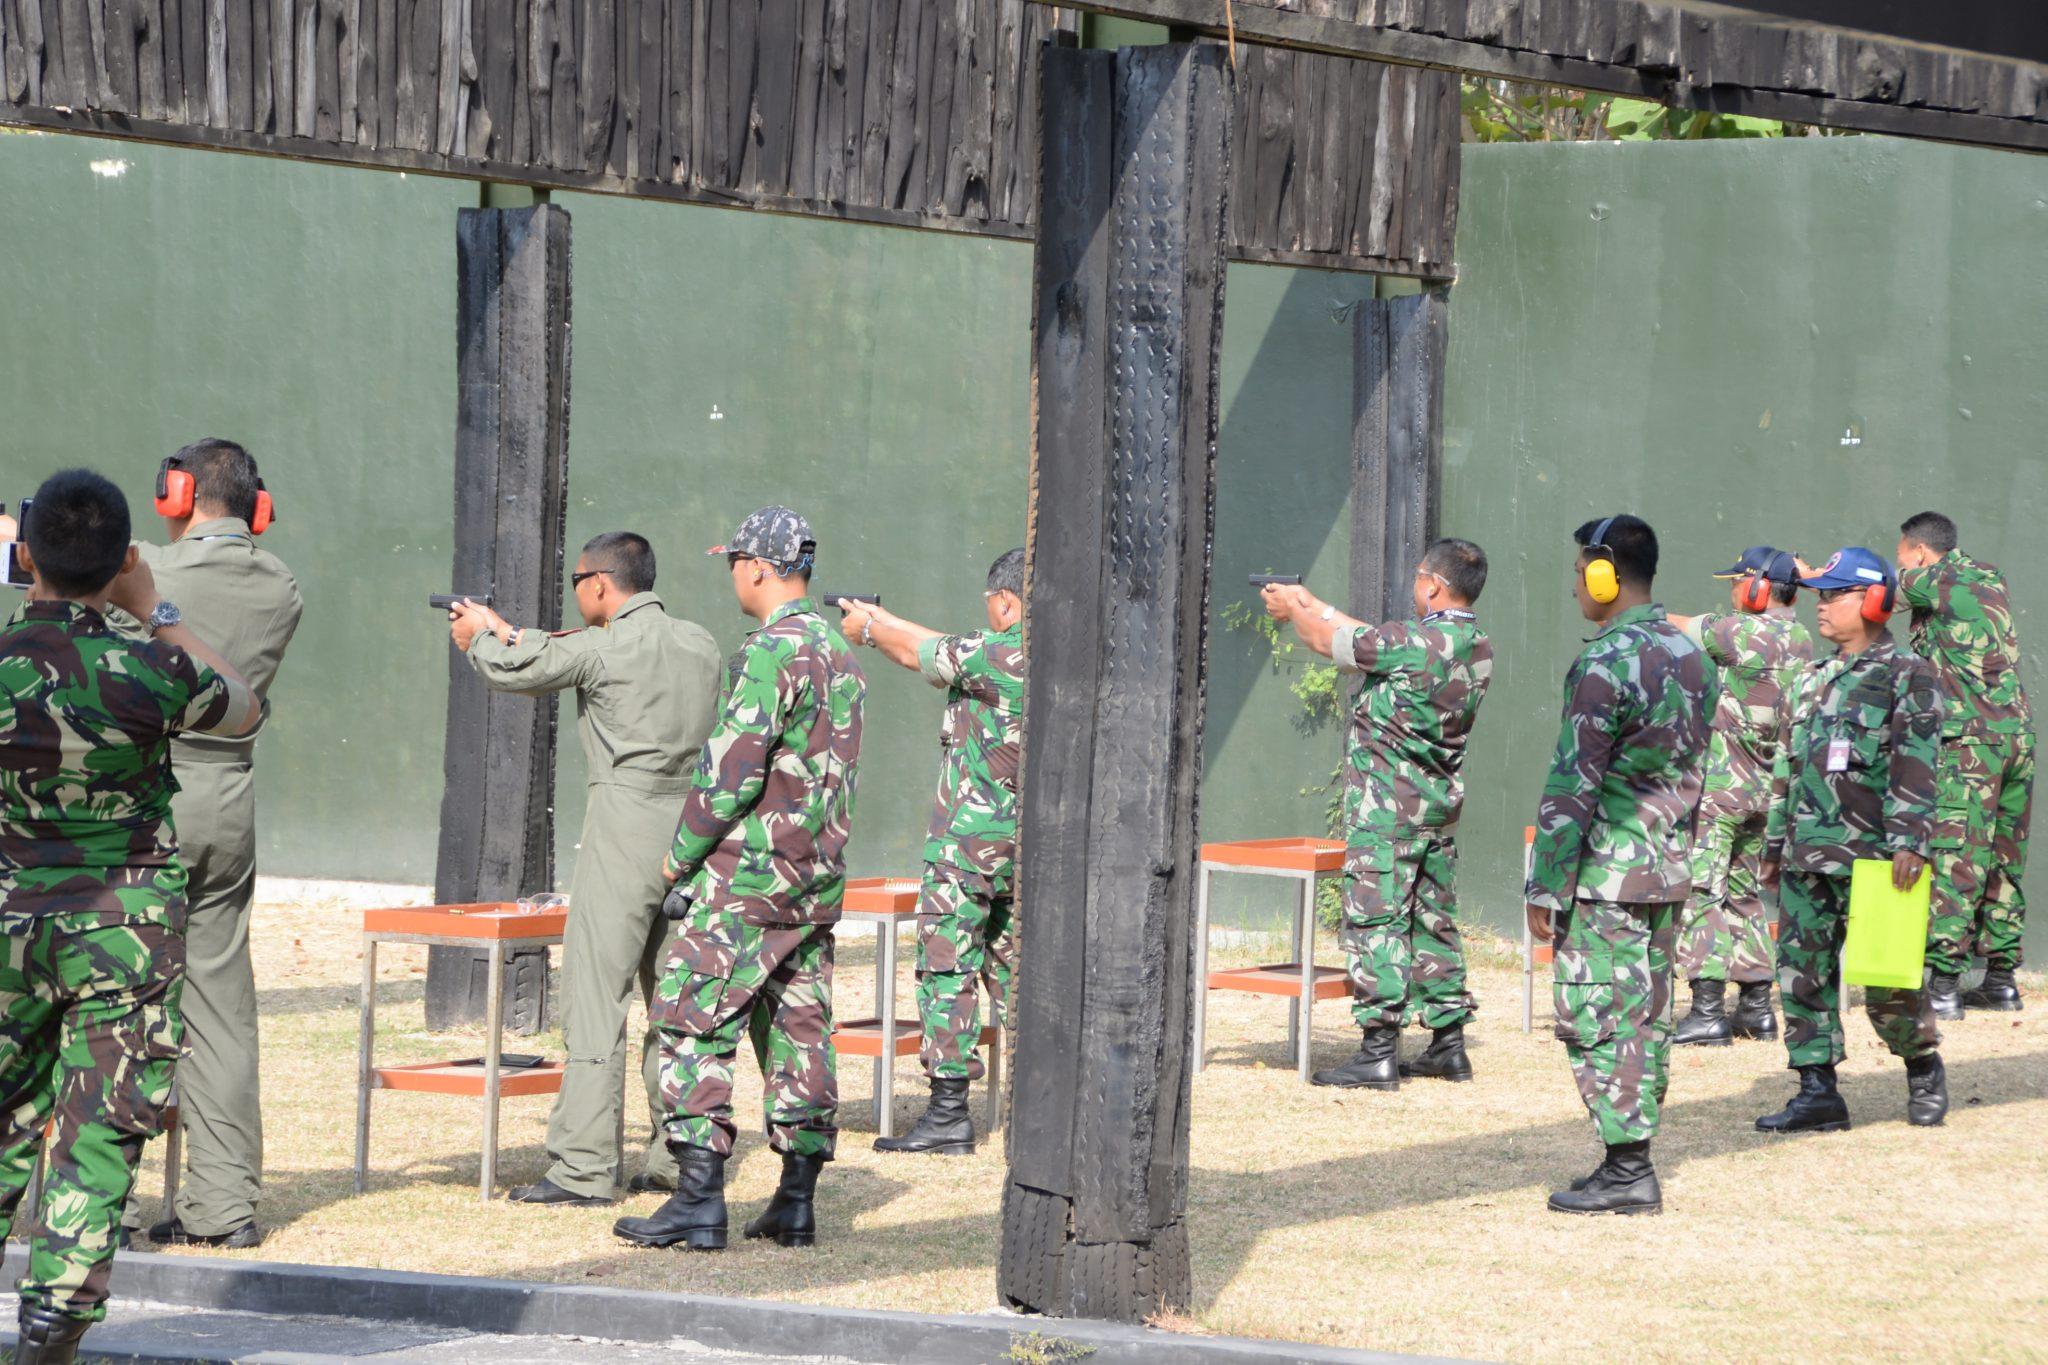 Asah Kemampuan dan Profesionalisme, Prajurit Lanud Adisutjipto Latihan Menembak